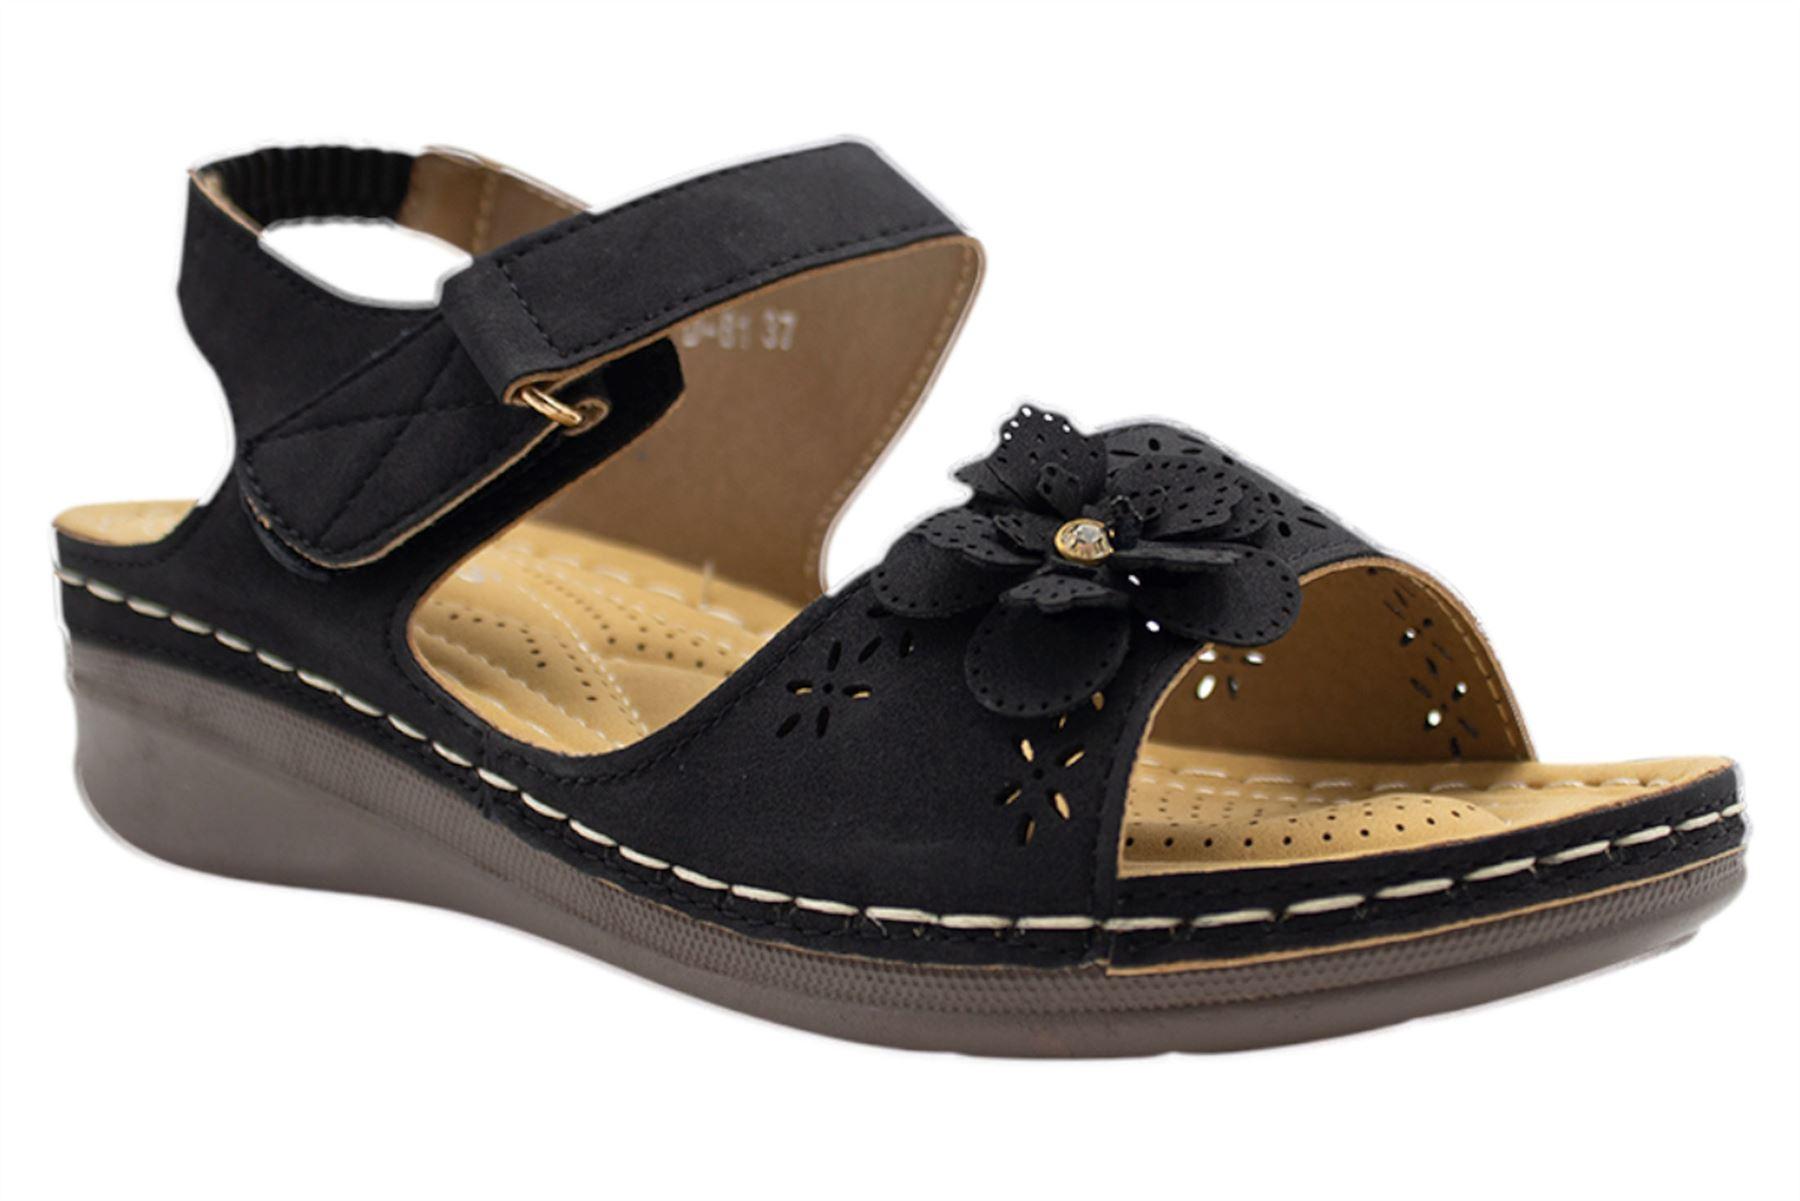 Ladies-Sandals-Womens-Mid-Heel-Comfort-Summer-Beach-Casual-Wear miniatura 19